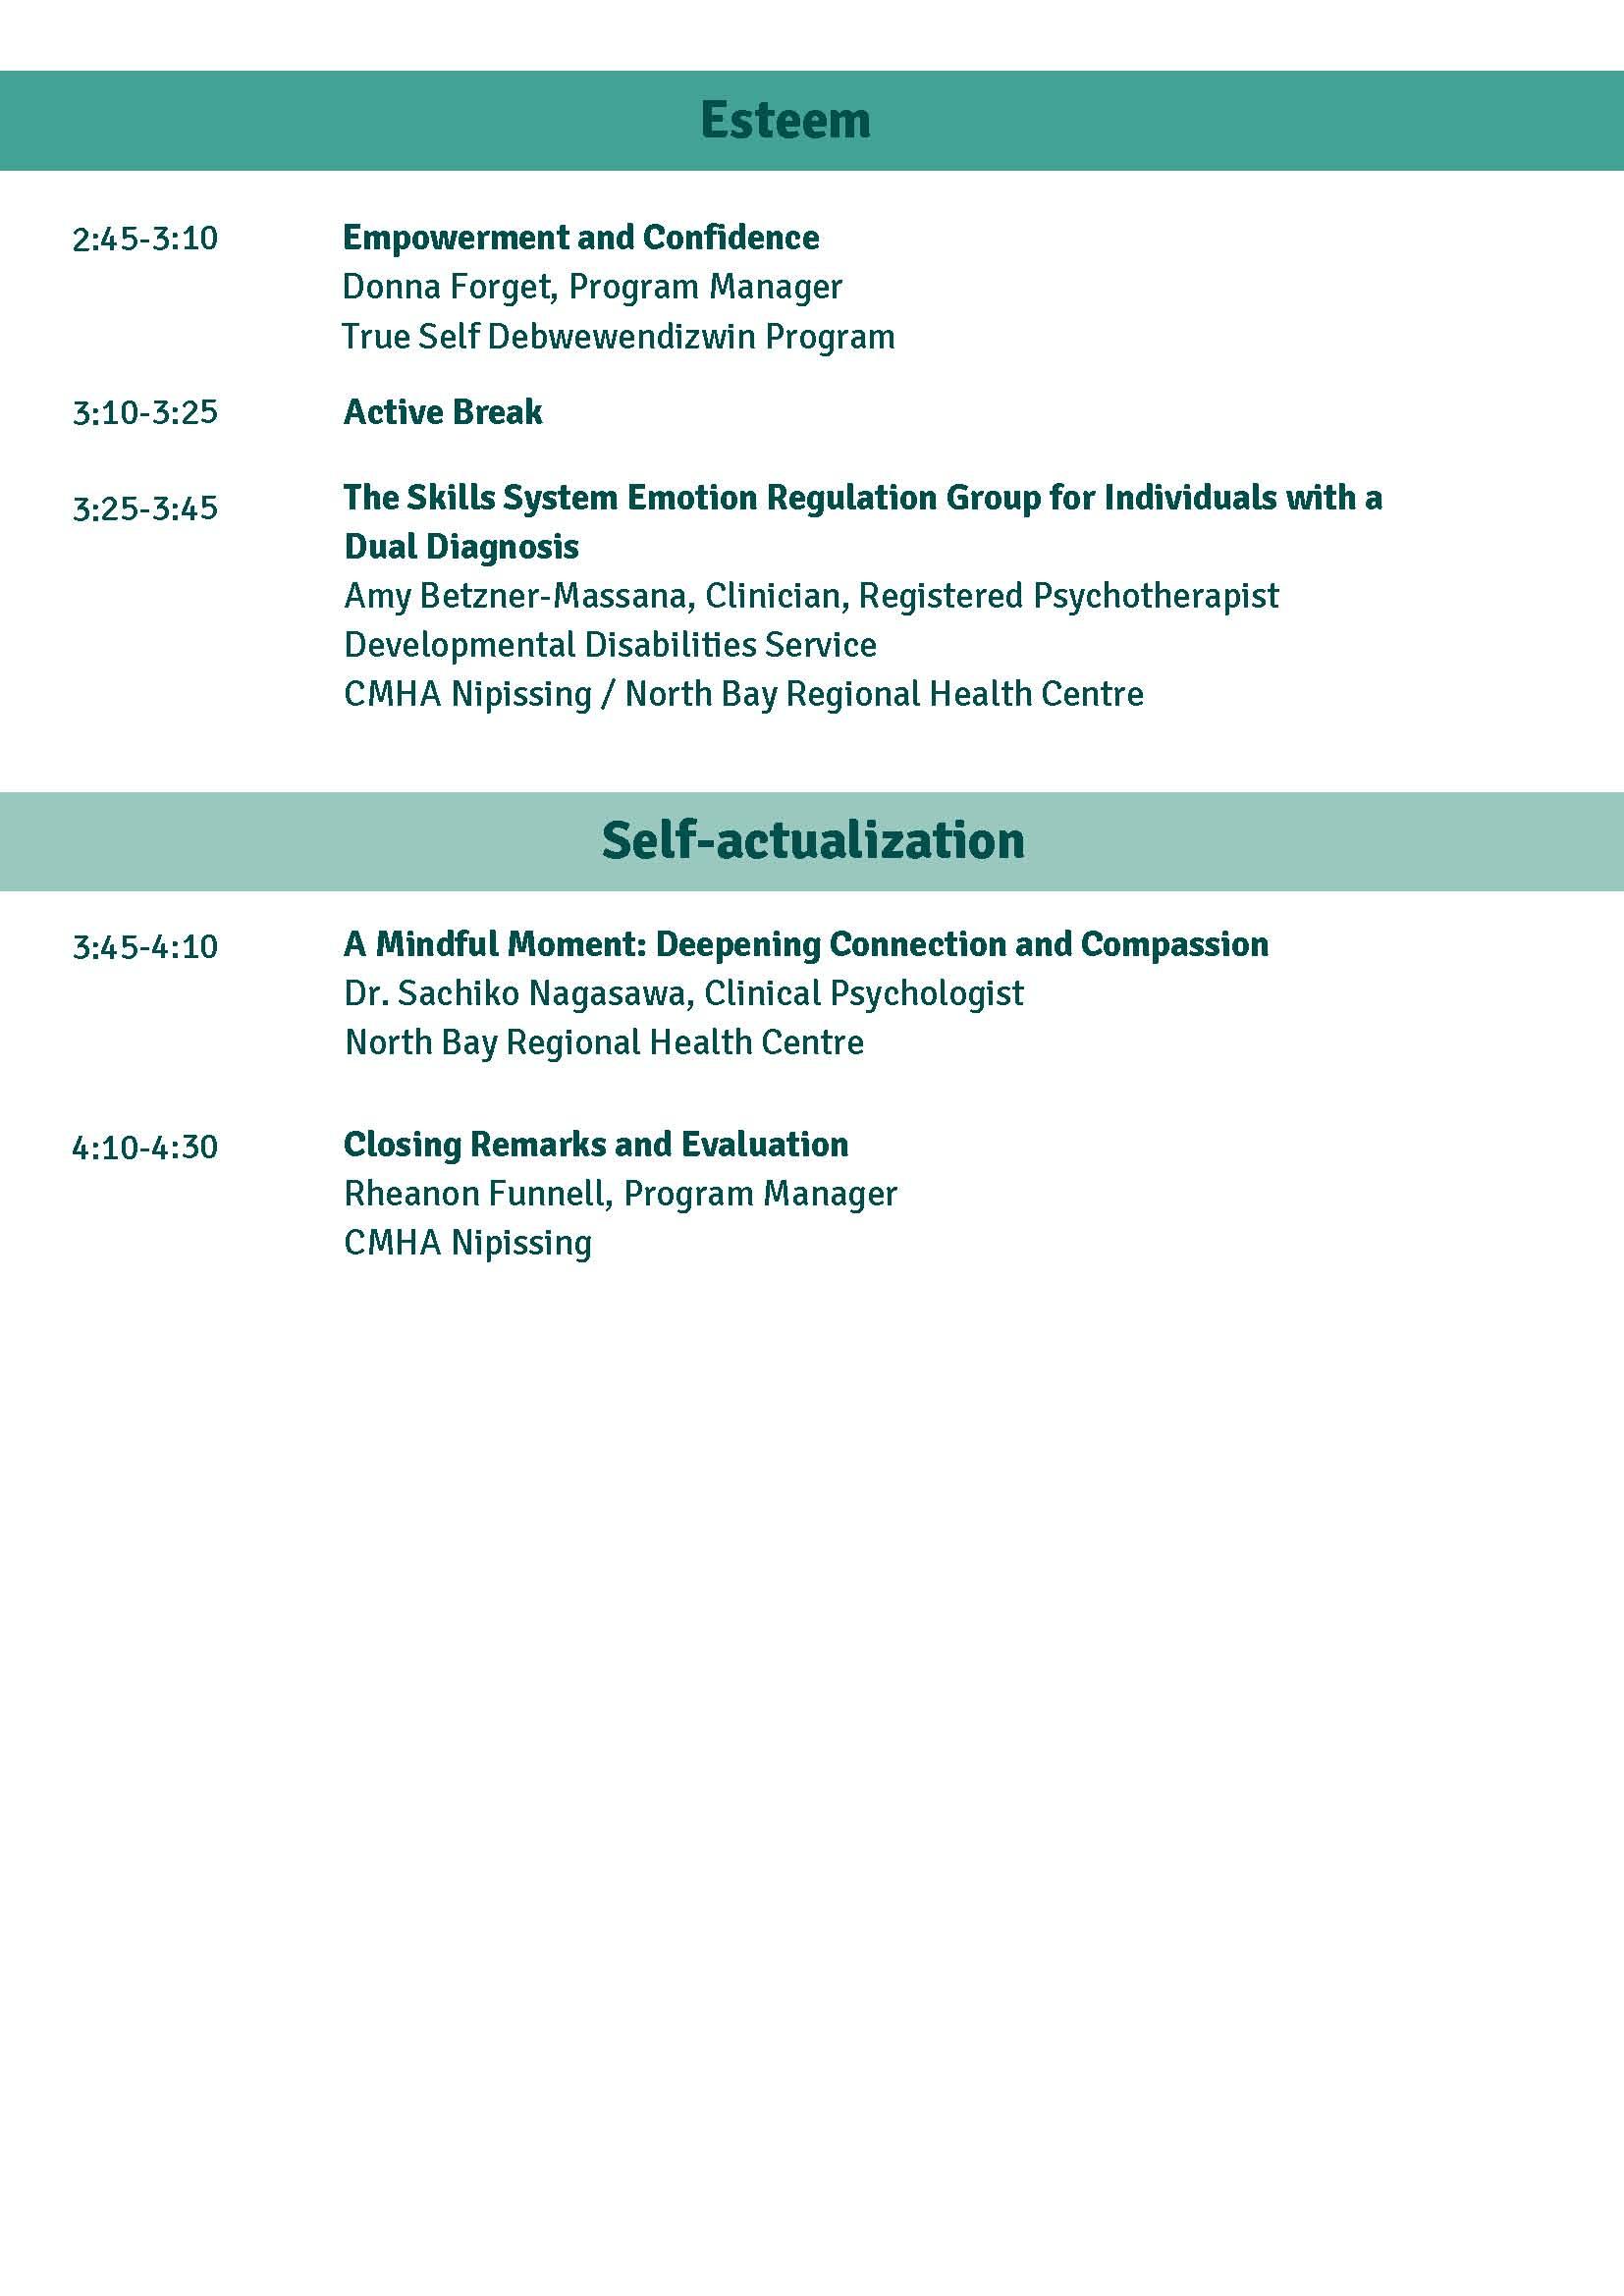 Agenda page 4